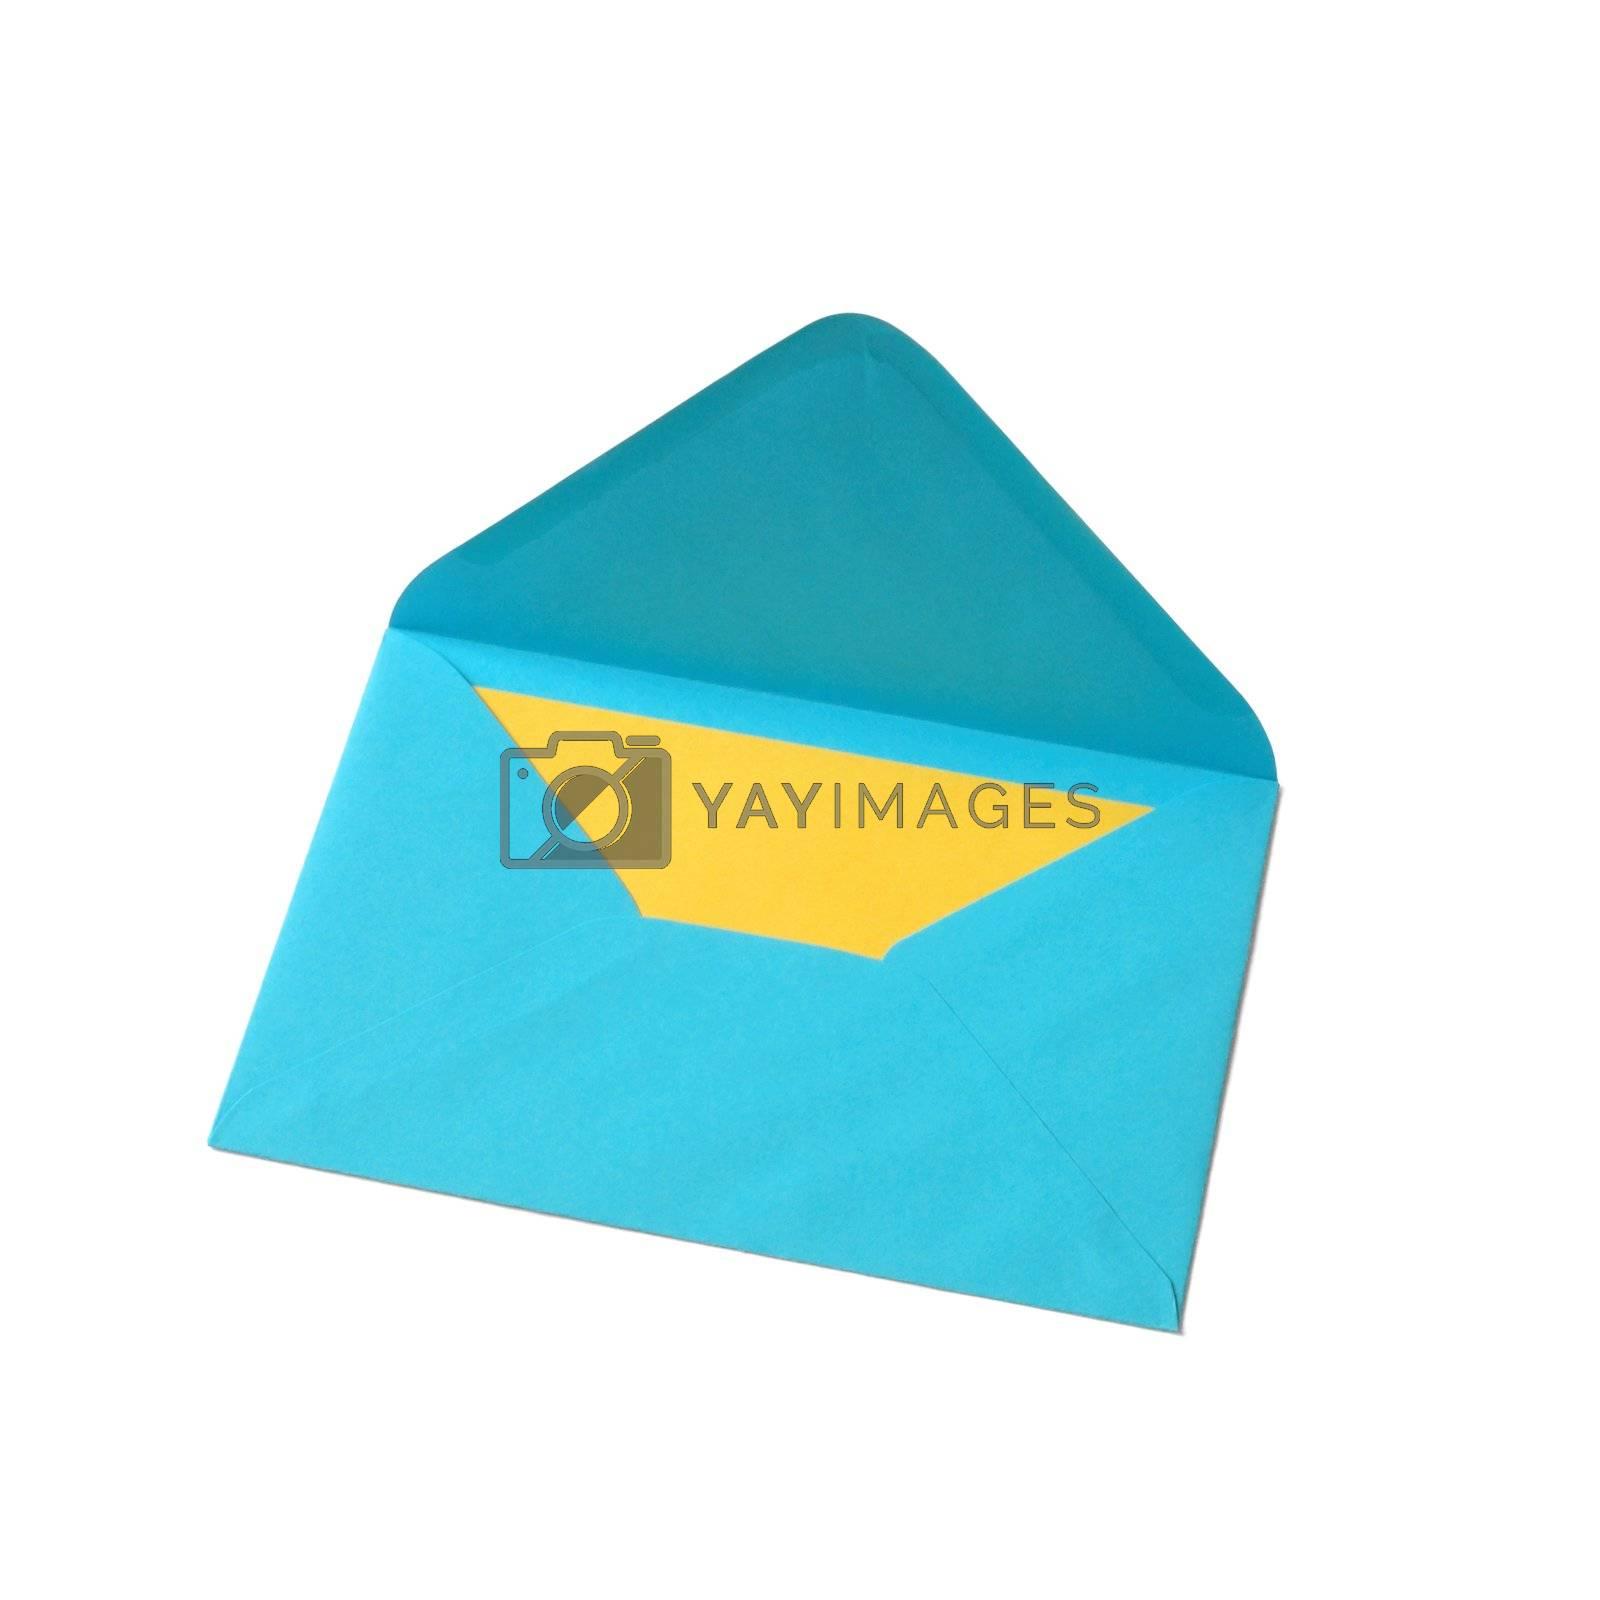 Isolated envelope